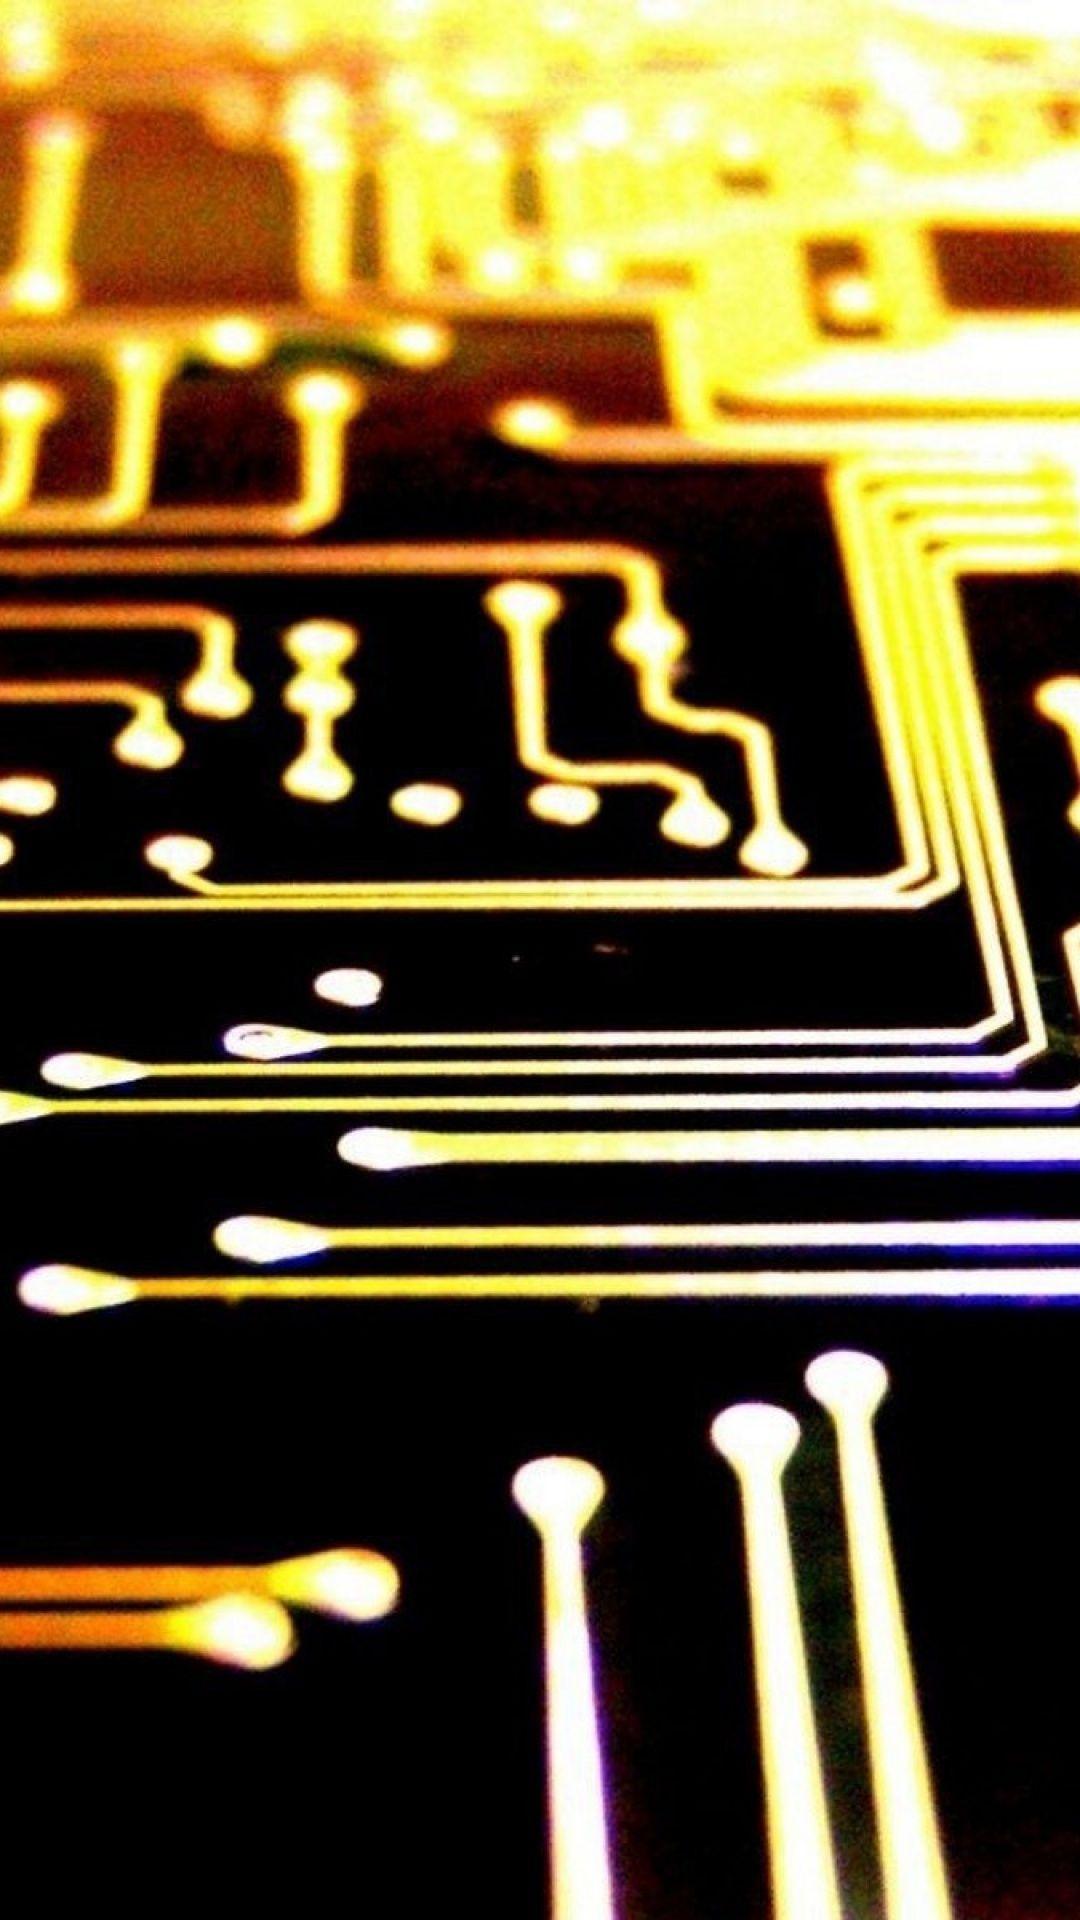 Gold Phone Lock Screen Wallpapers - Top